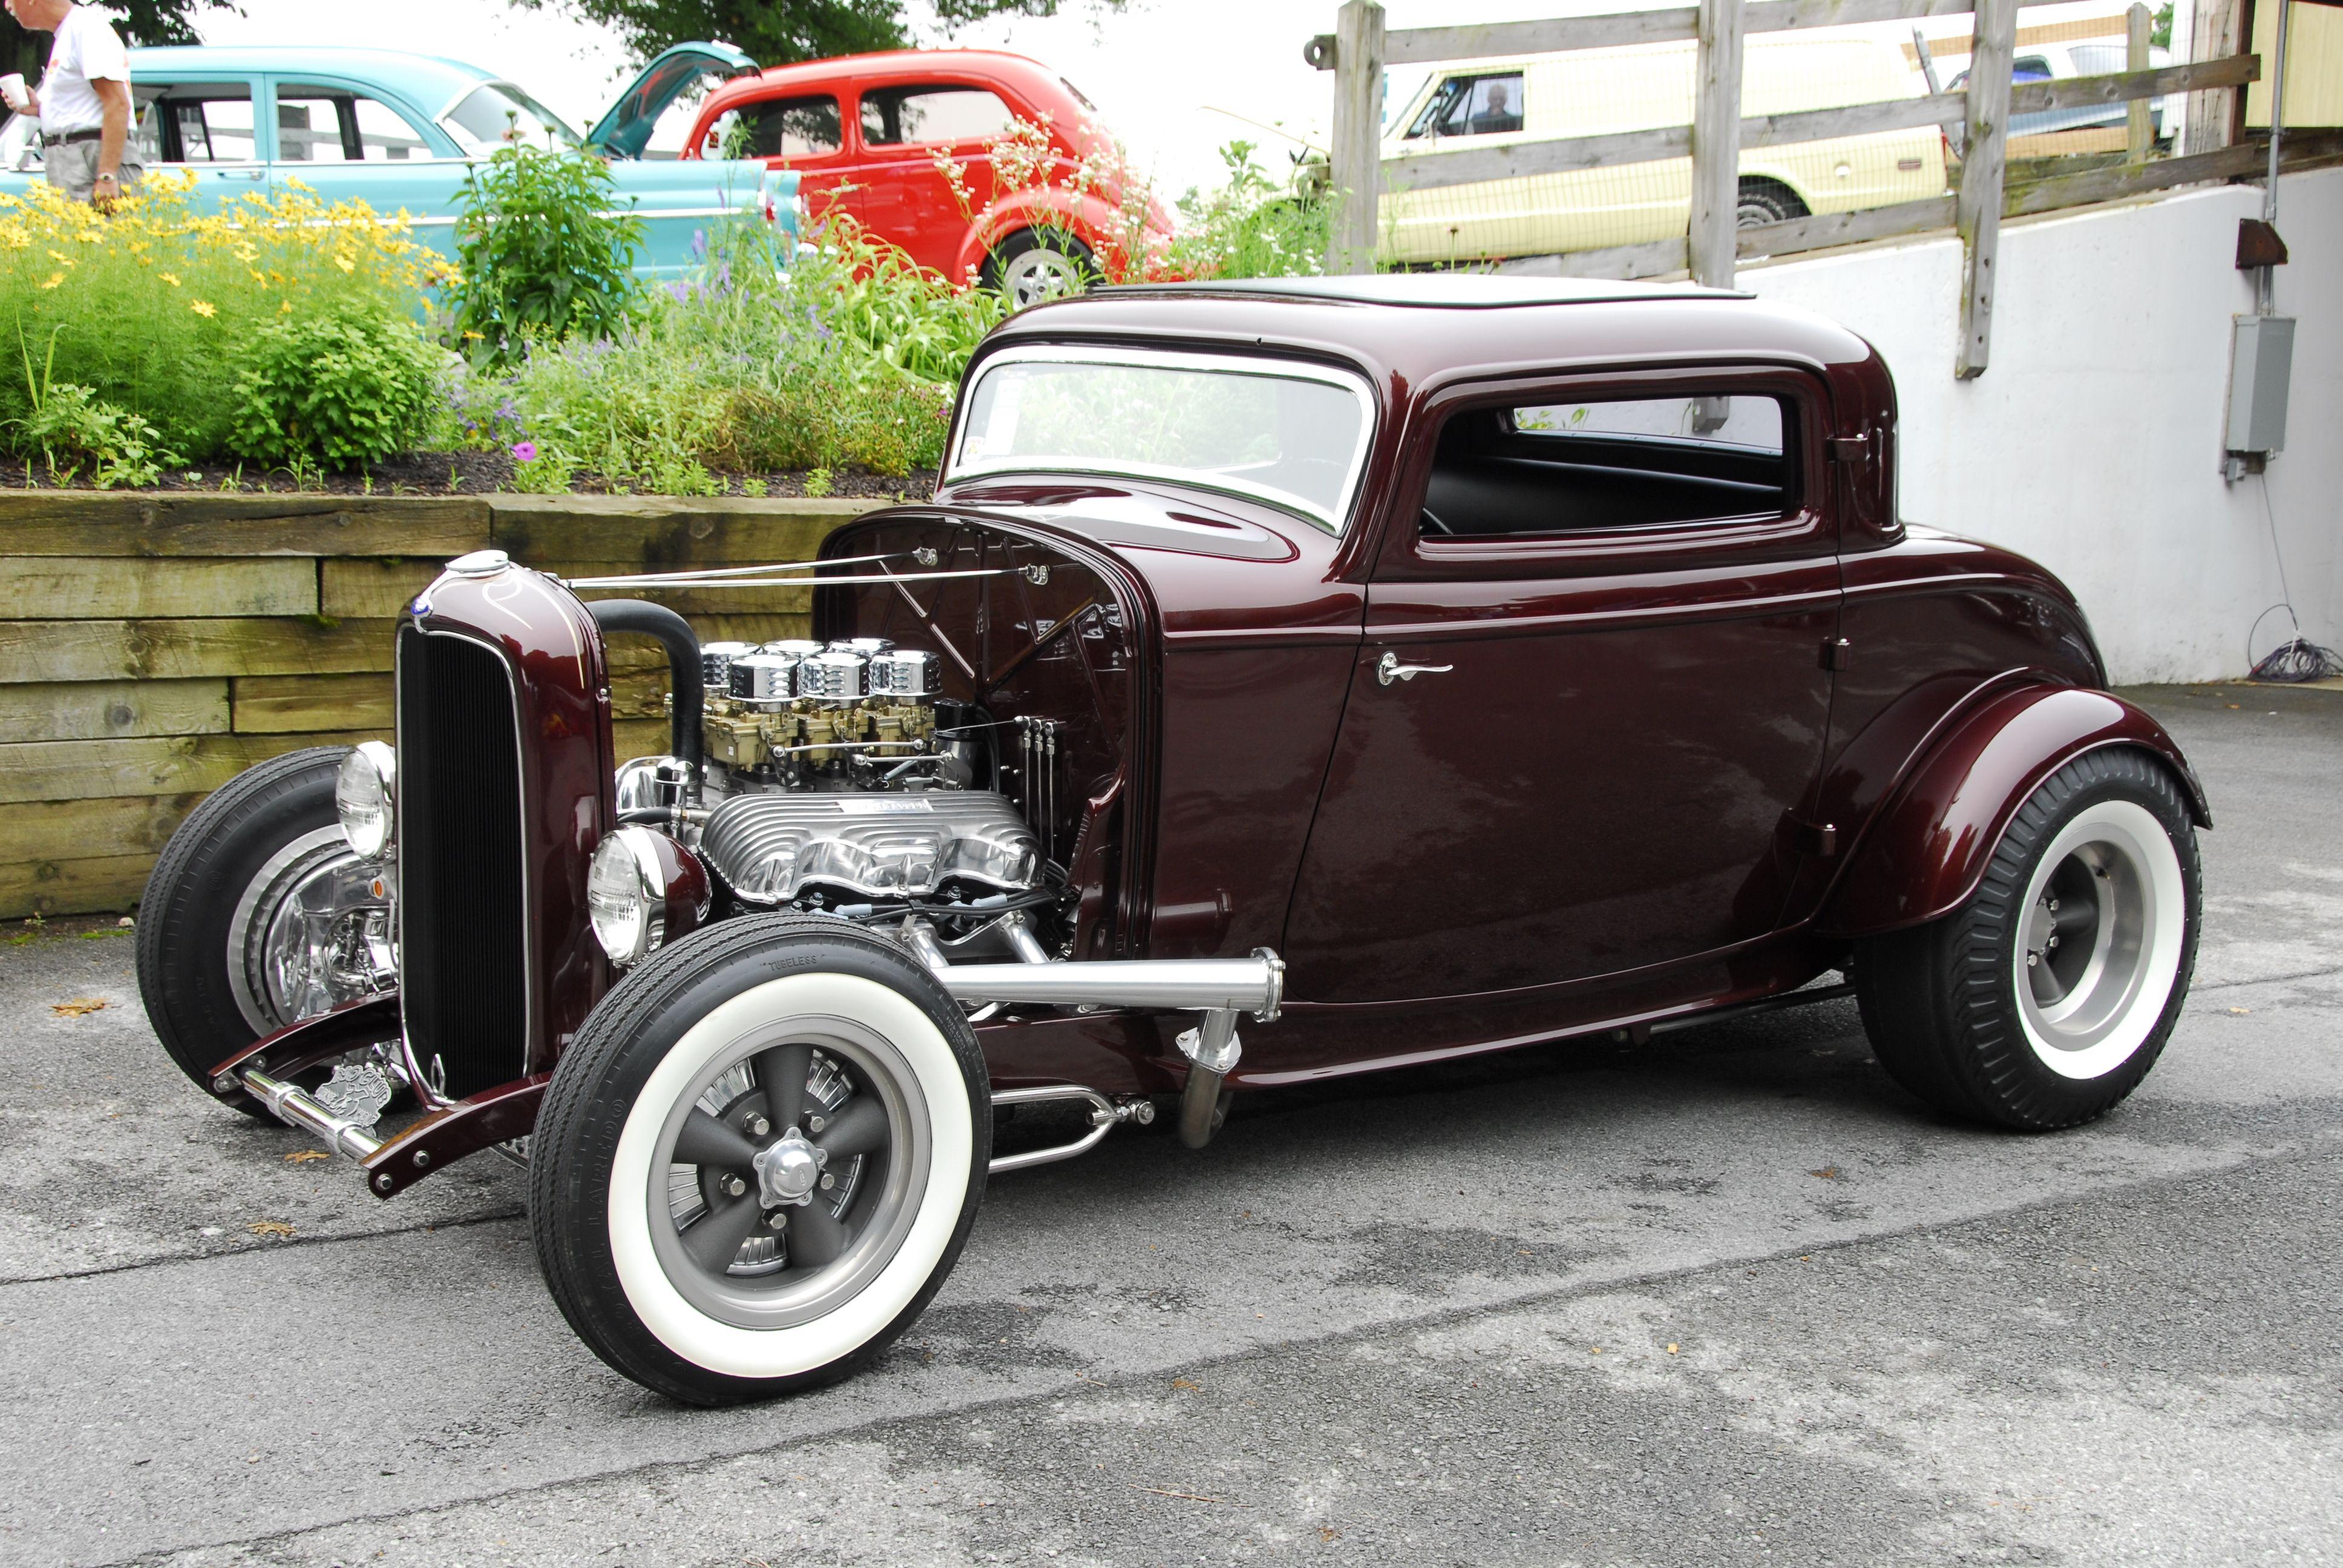 Image result for 1932 ford 1/25 model | Model Cars | Pinterest ...